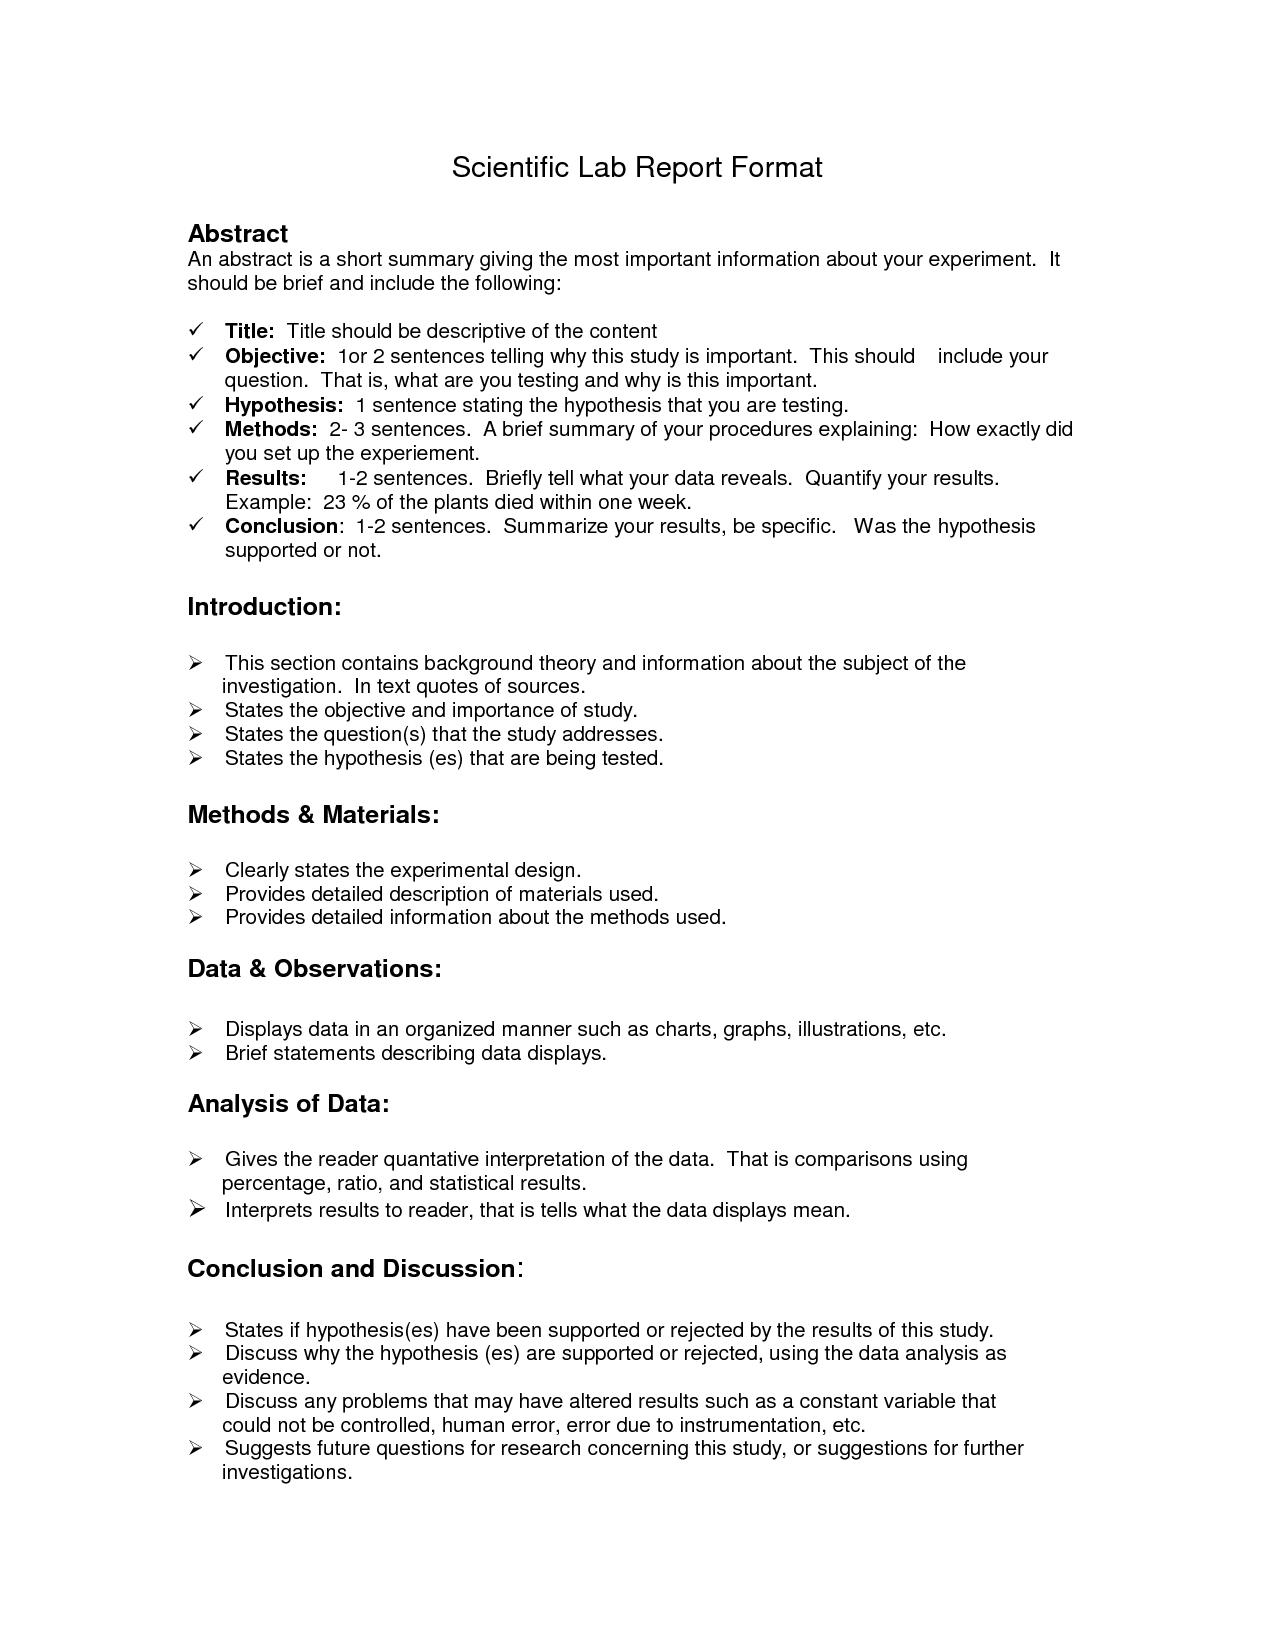 Lab Report Format Doc  Environmental Science Lessons  Lab Report In Formal Lab Report Template